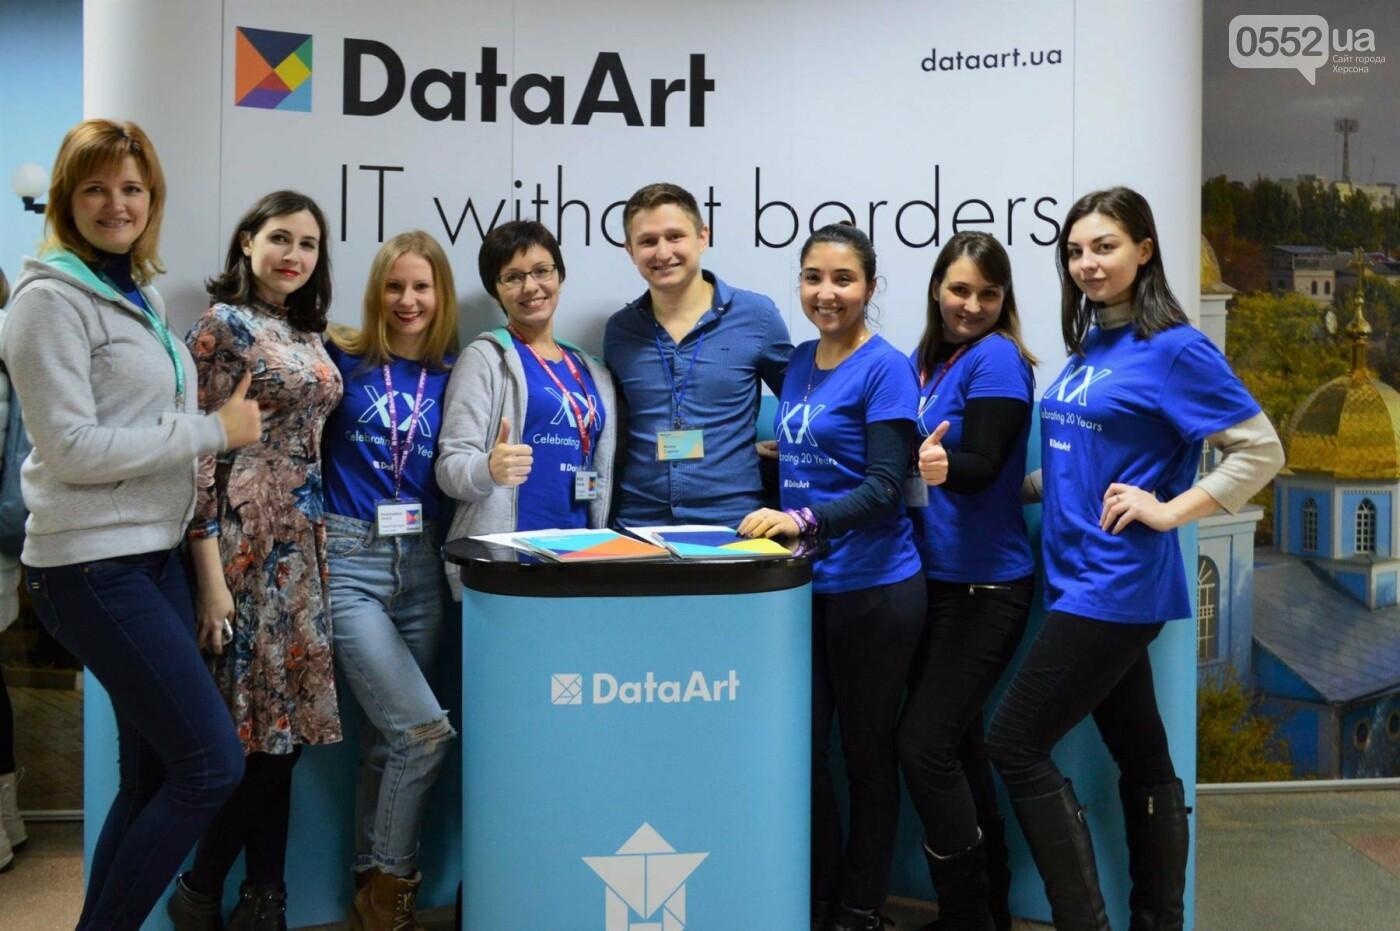 Херсонский центр разработки DataArt отметил 11 лет, фото-1